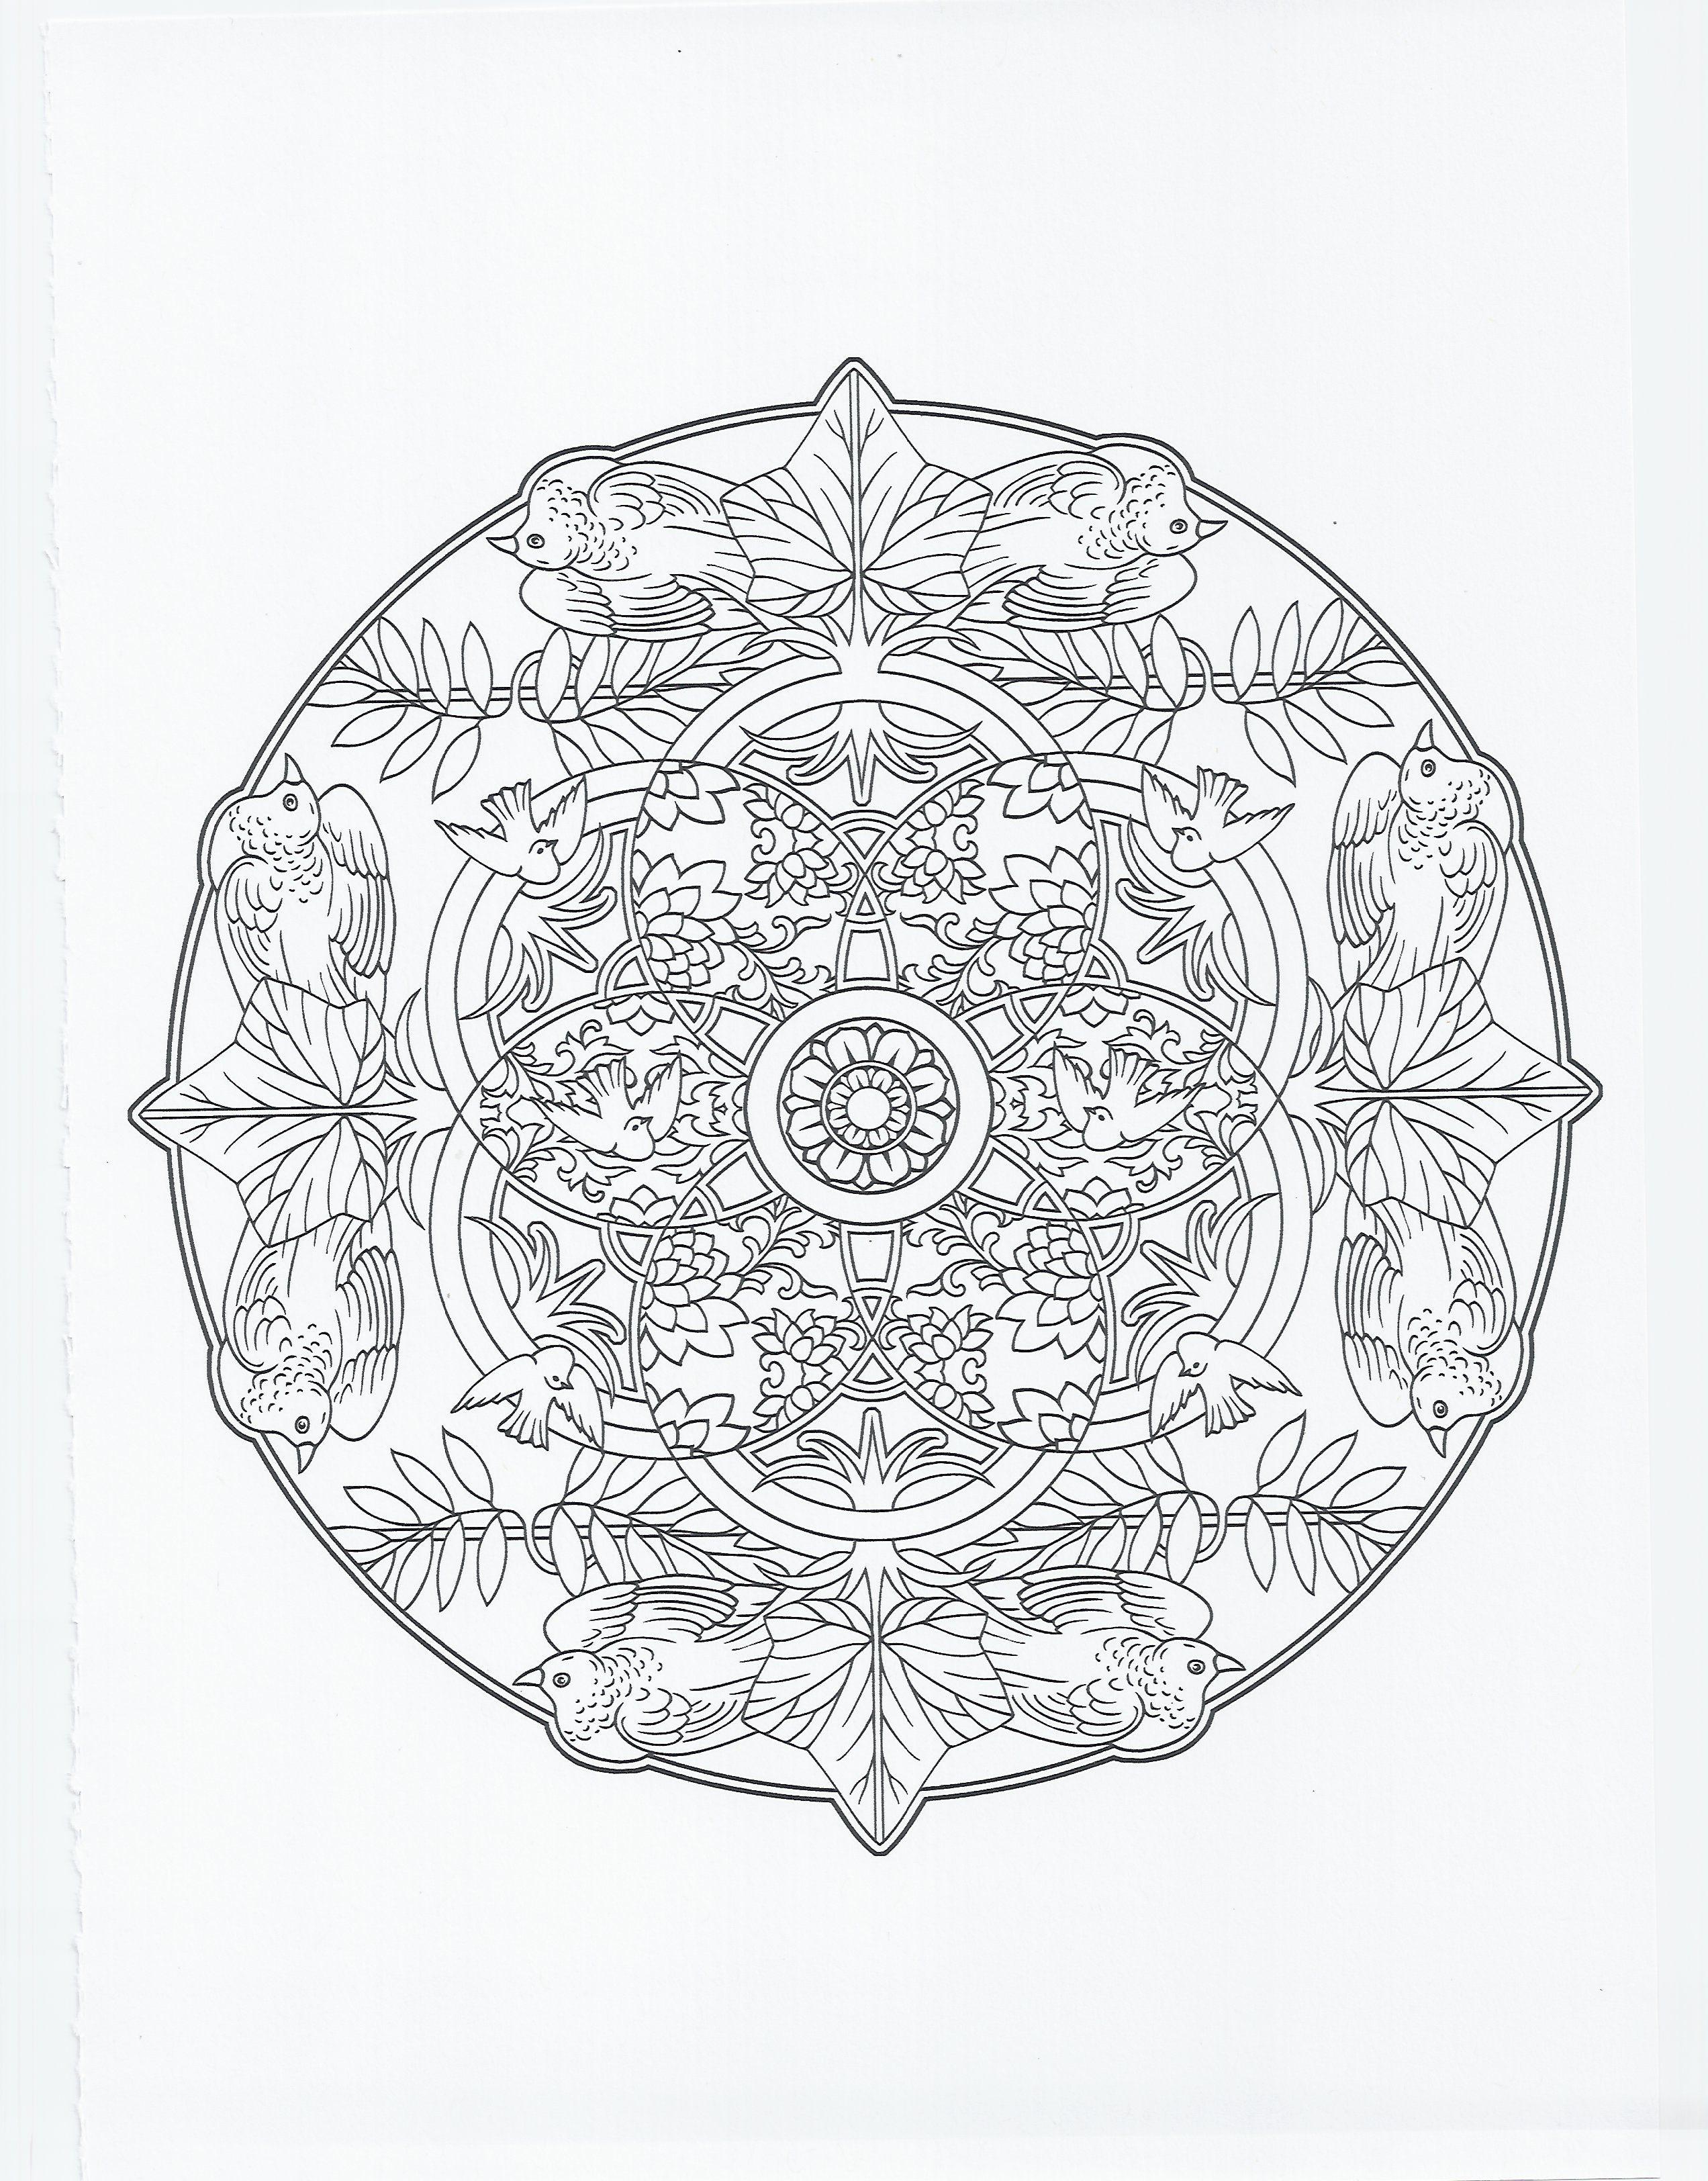 Mandala Herbst Zum Ausdrucken Inspirierend 28 Schön Ausmalbilder Mandala Tiere Mickeycarrollmunchkin Fotografieren